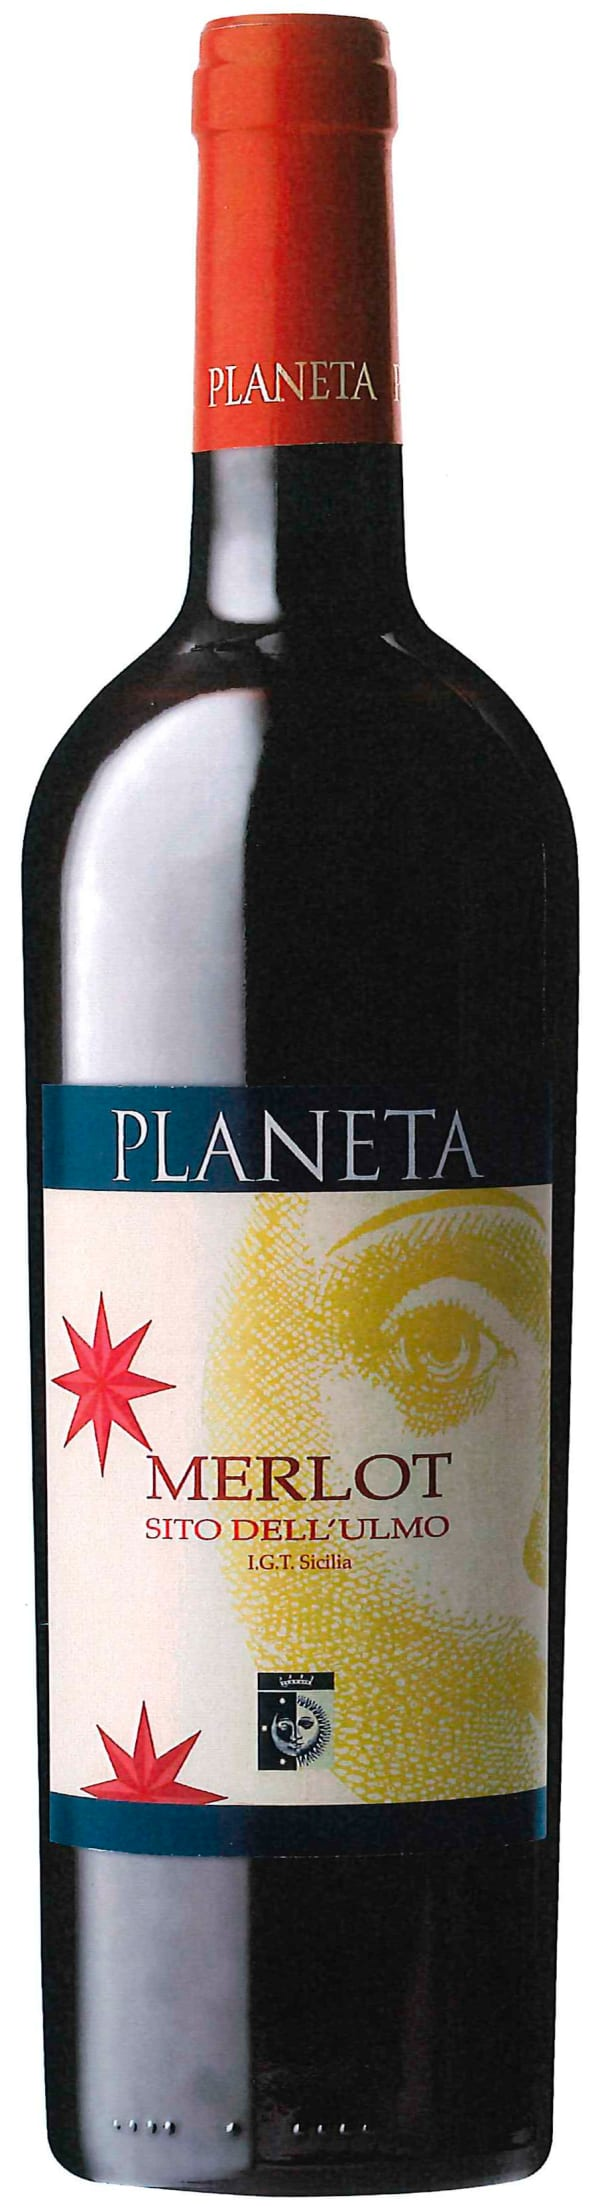 Planeta Merlot 2015